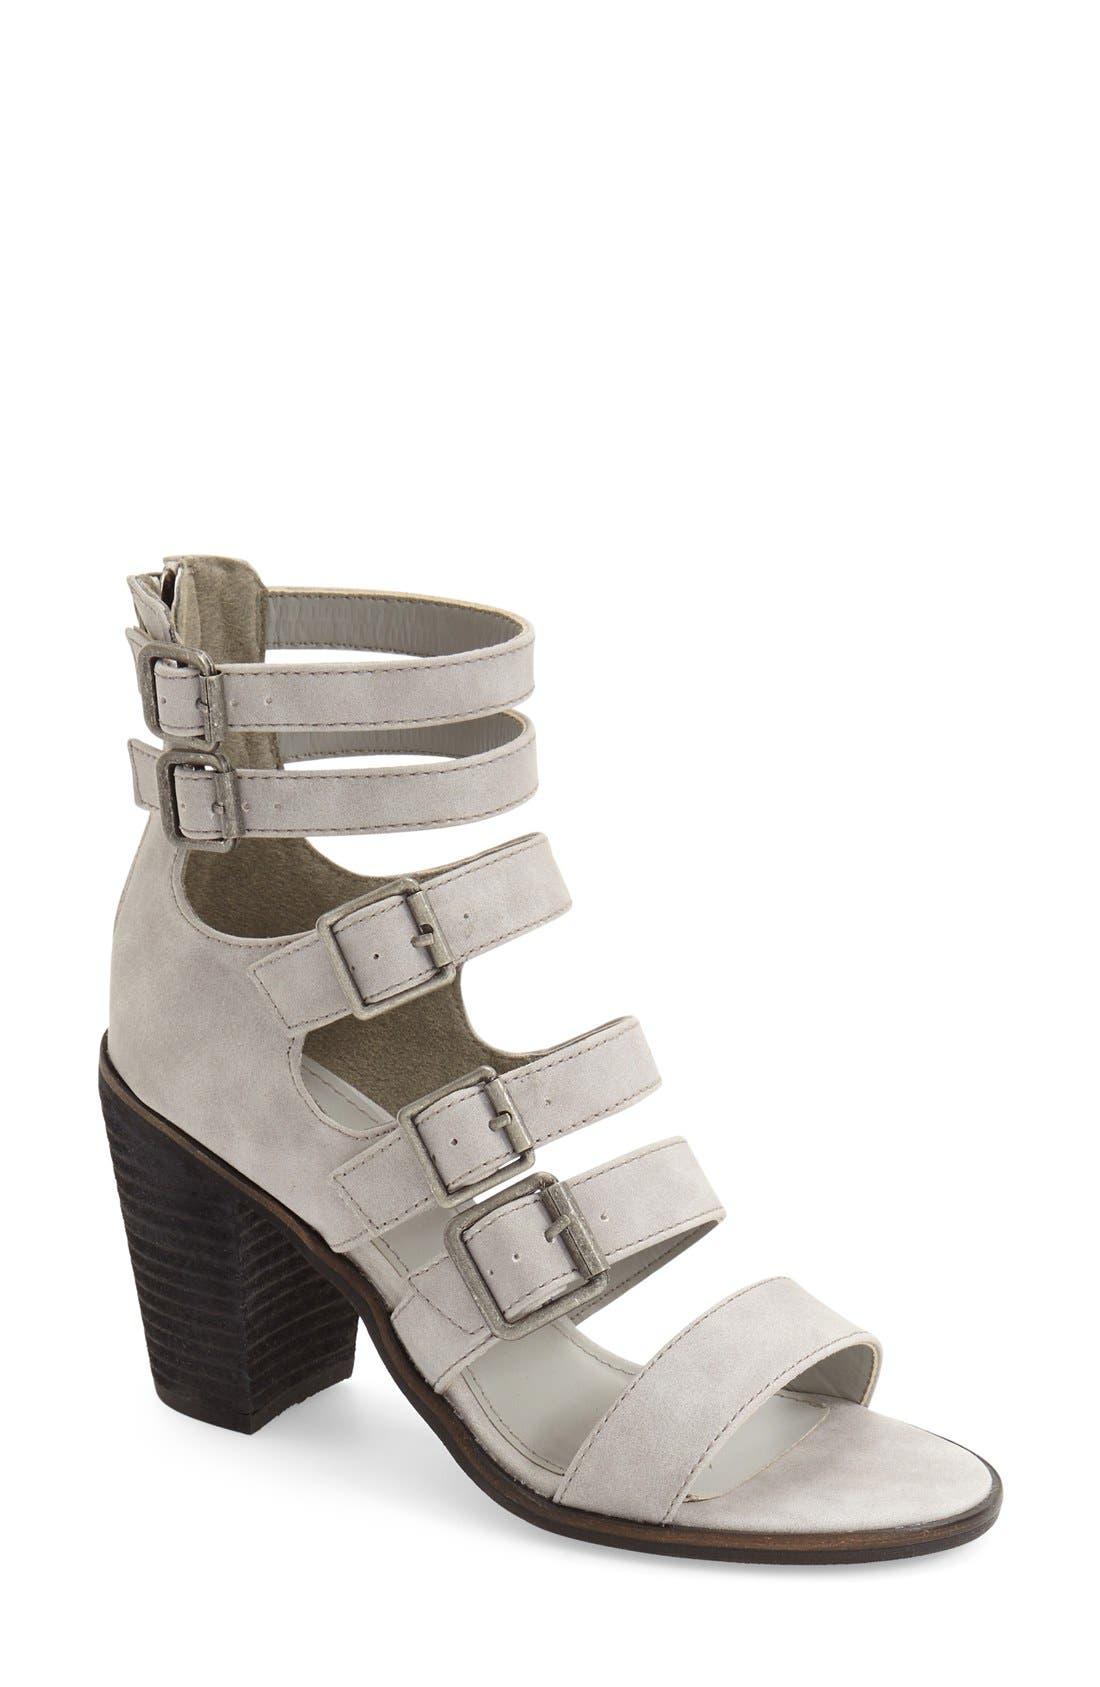 Alternate Image 1 Selected - Rebels 'Yandy' Strappy Block Heel Sandal (Women)